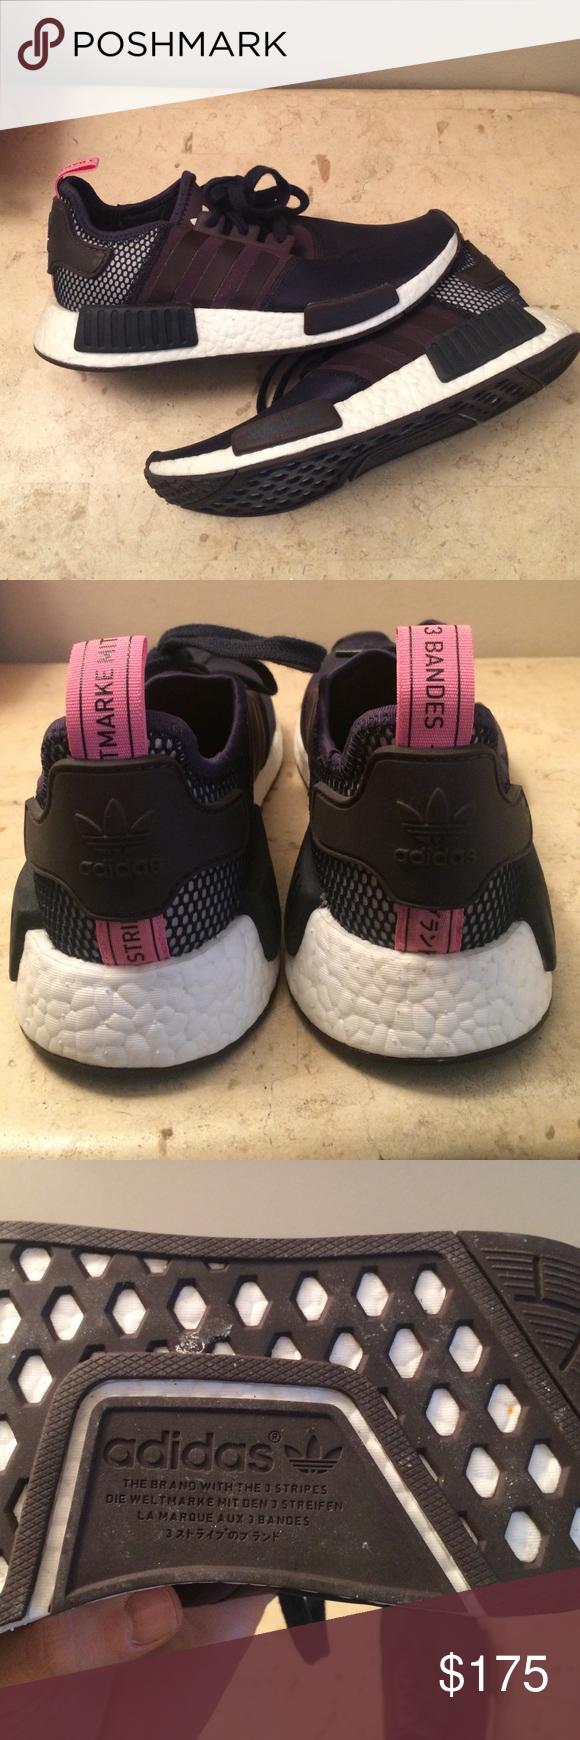 adidas stimolare le donne scarpe adidas scarpe adidas e adidas superstar